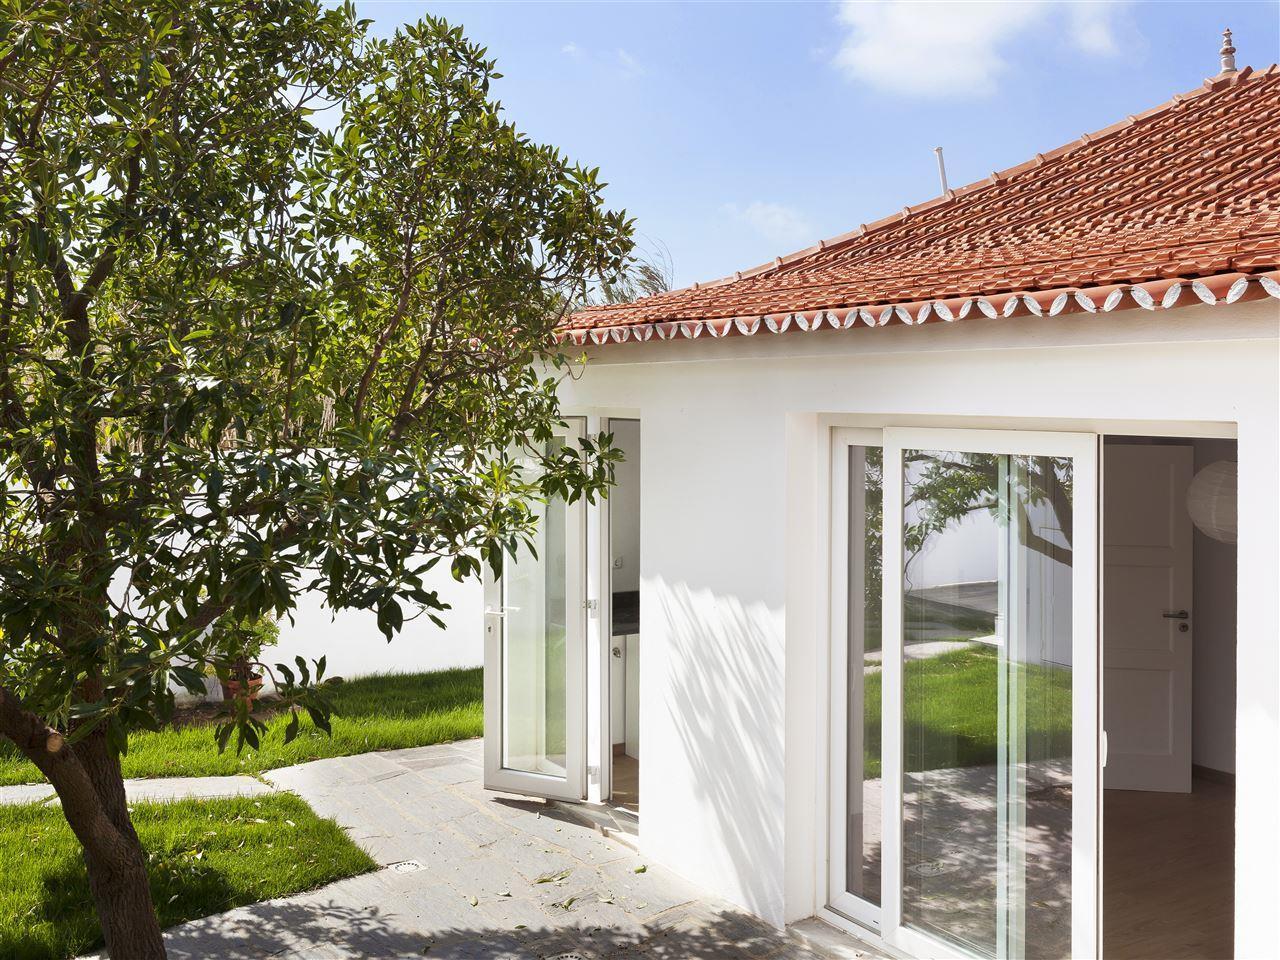 Moradia para Venda às Detached house, 2 bedrooms, for Sale Sintra, Lisboa Portugal